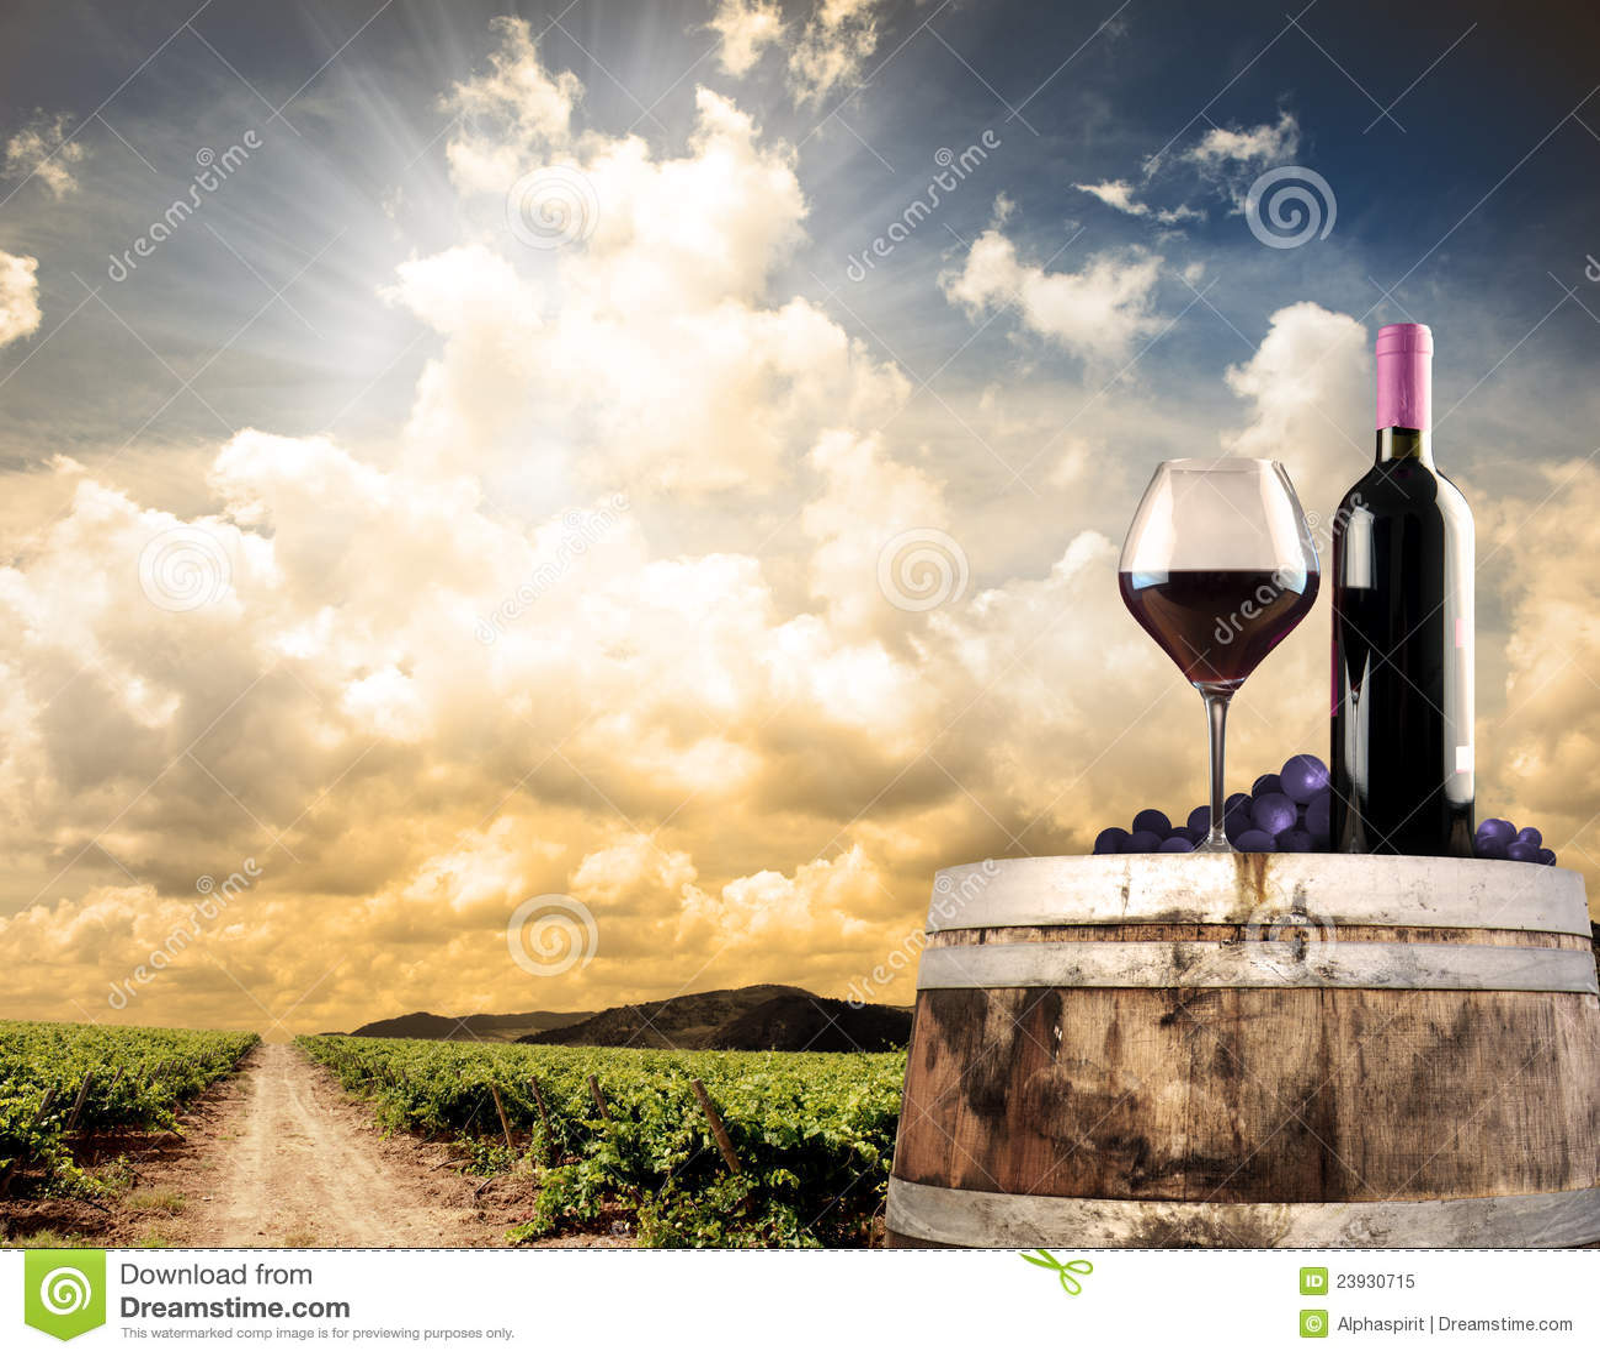 Wine still life against vineyard